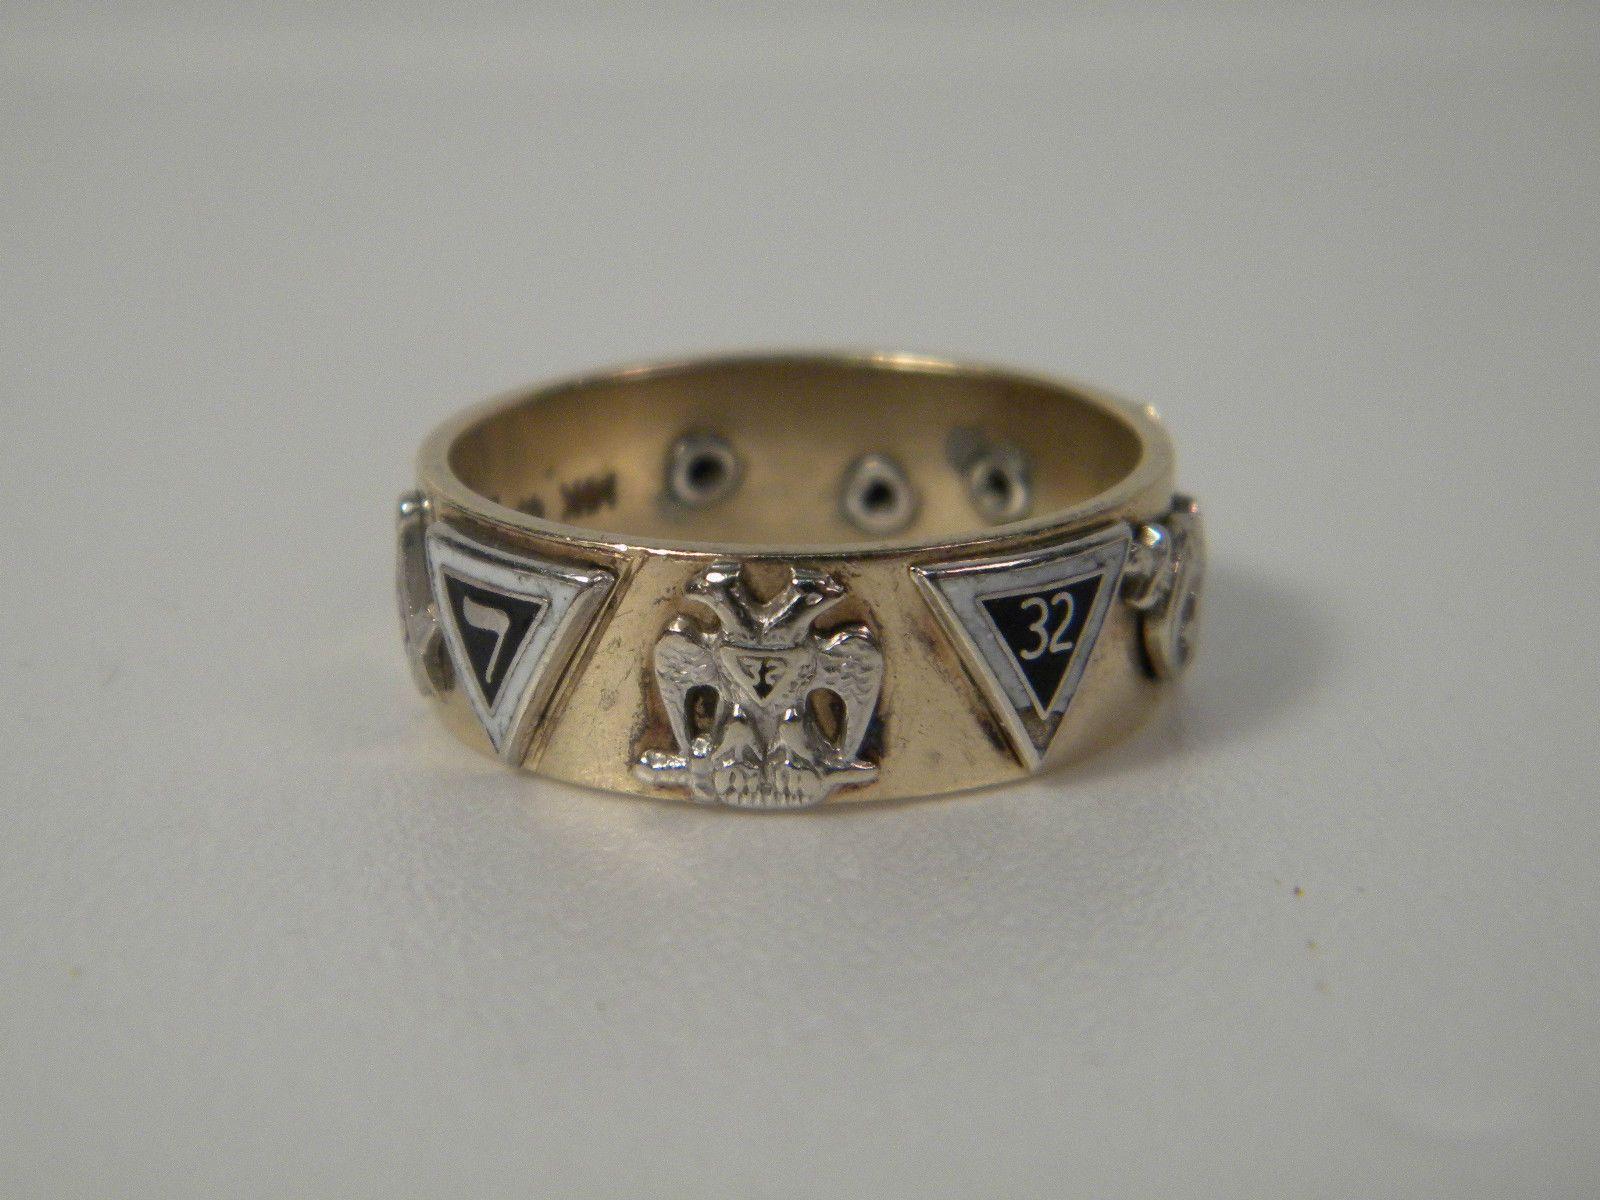 32nd master mason ring york rite 14 kt gold masonic knights templar